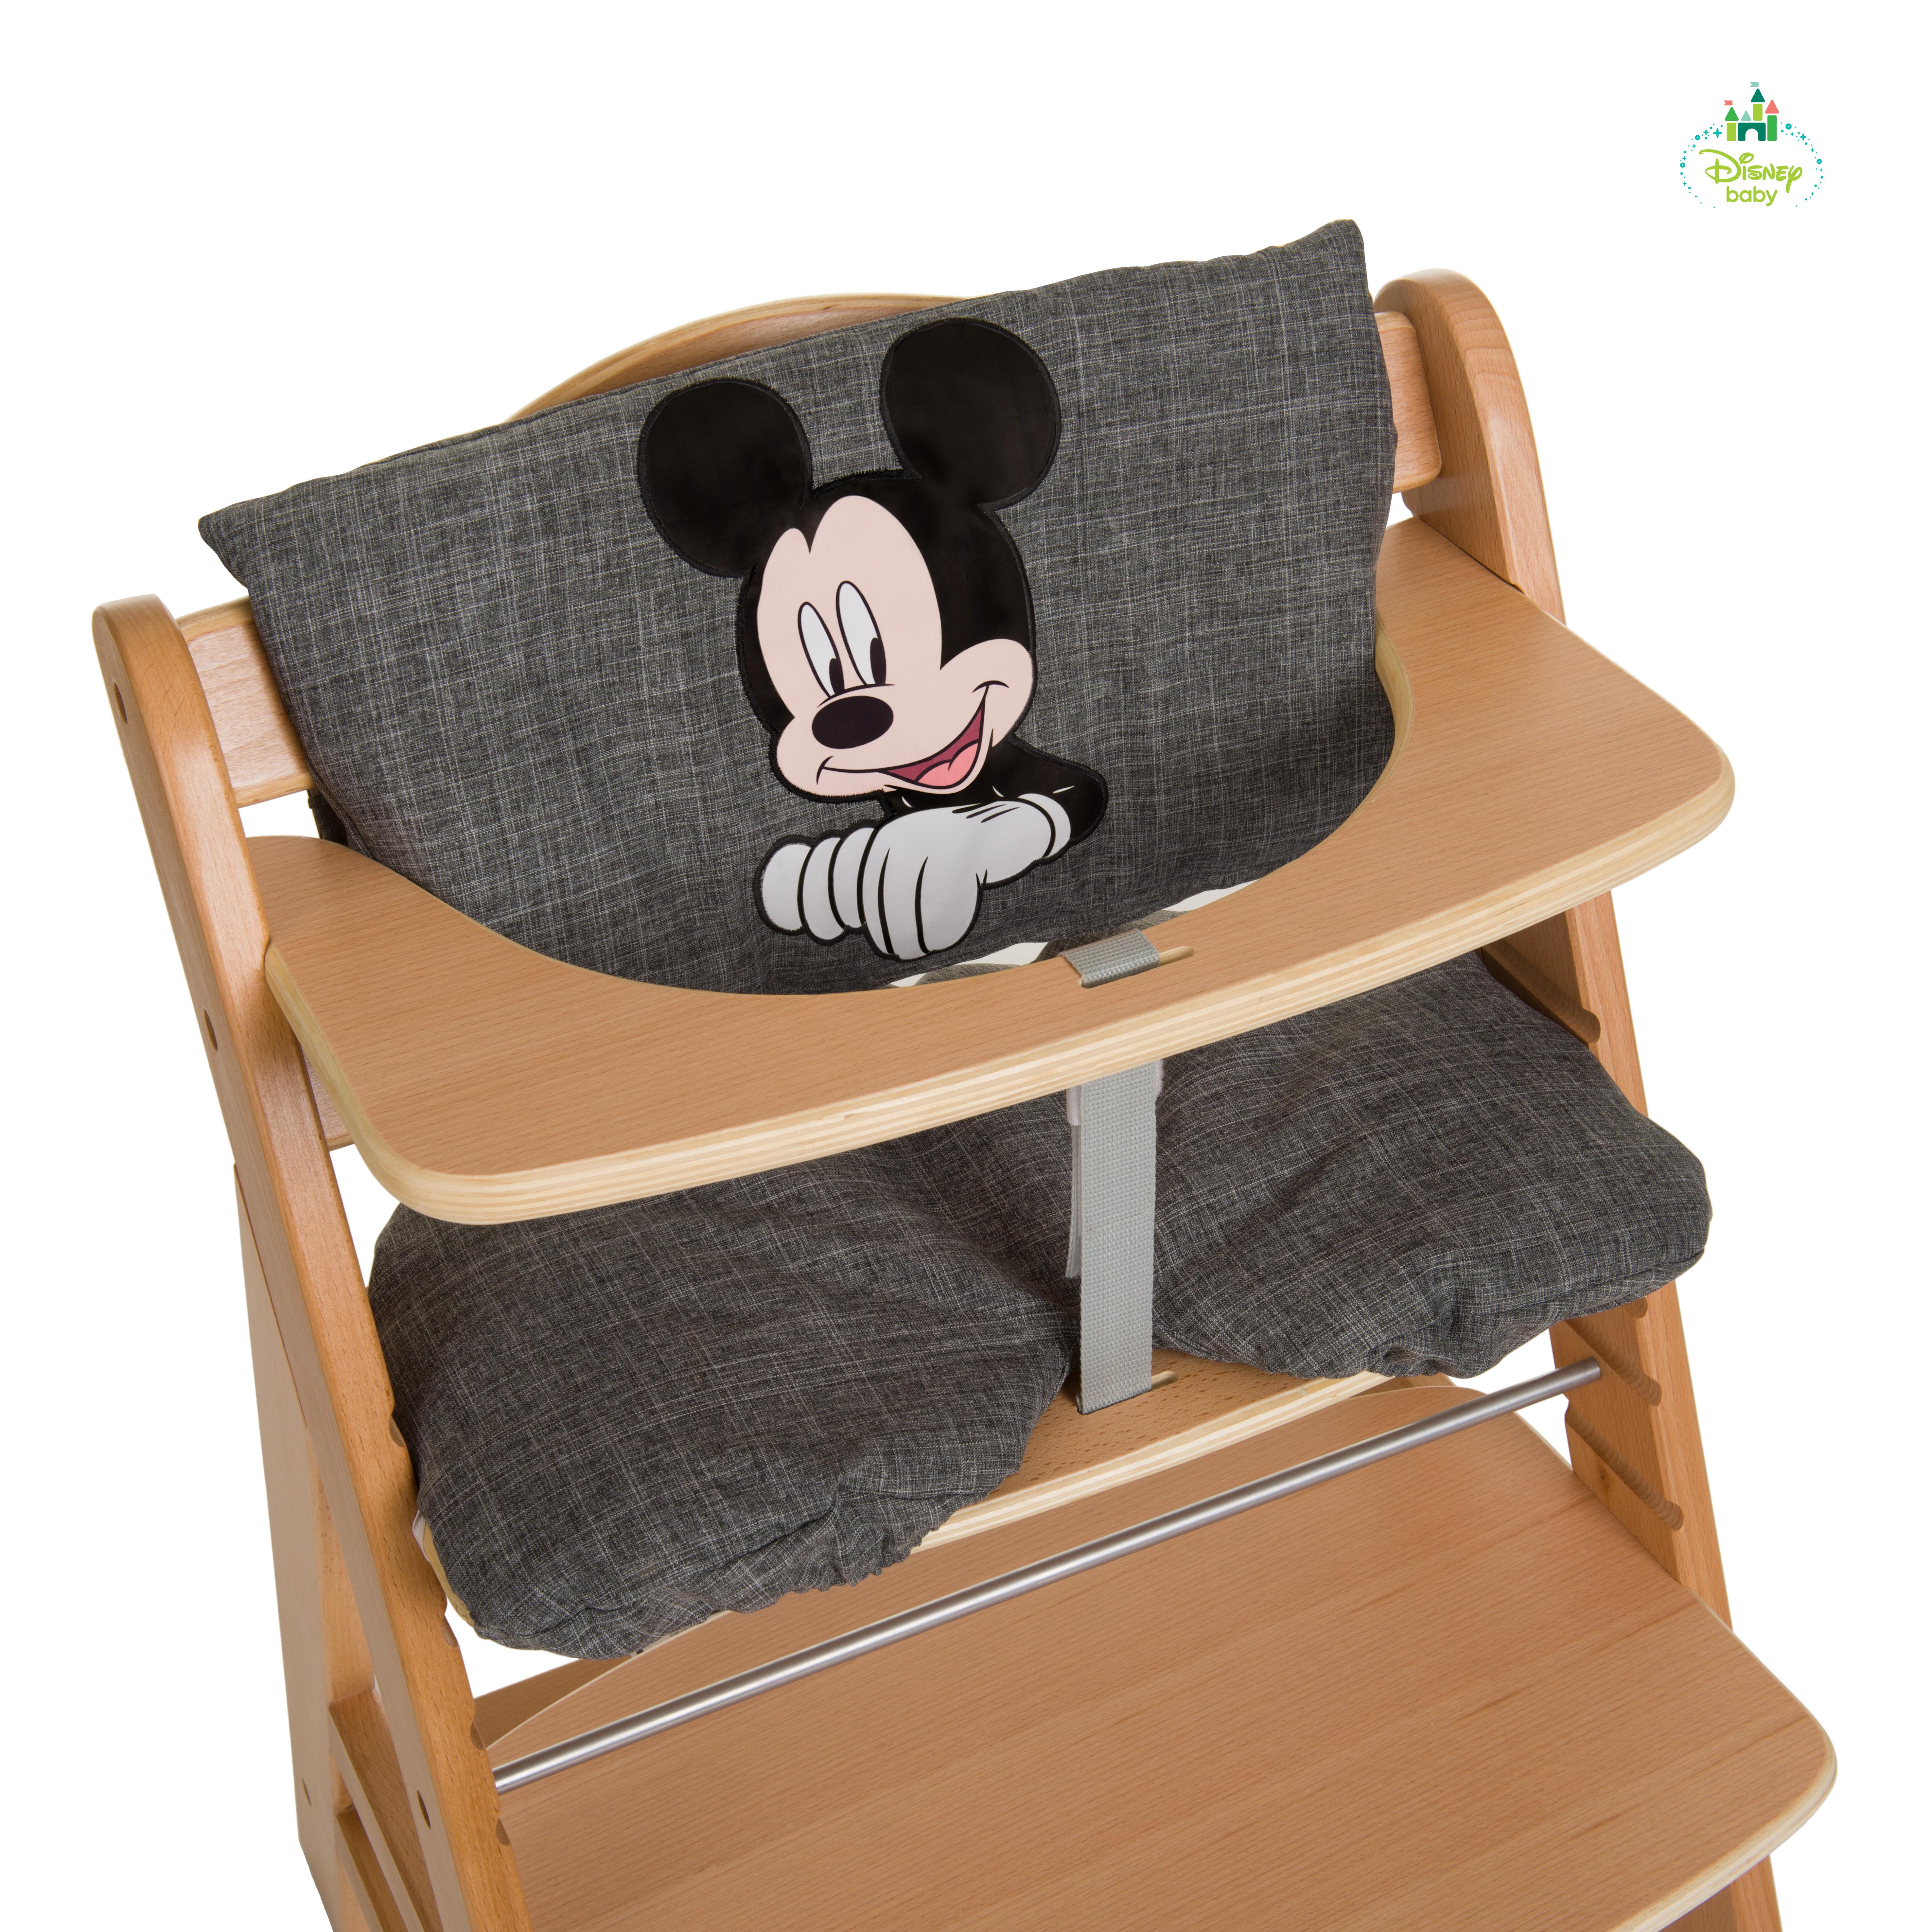 Hauck Disney Potah DeLuxe 2017 na židličku Alpha: mickey grey